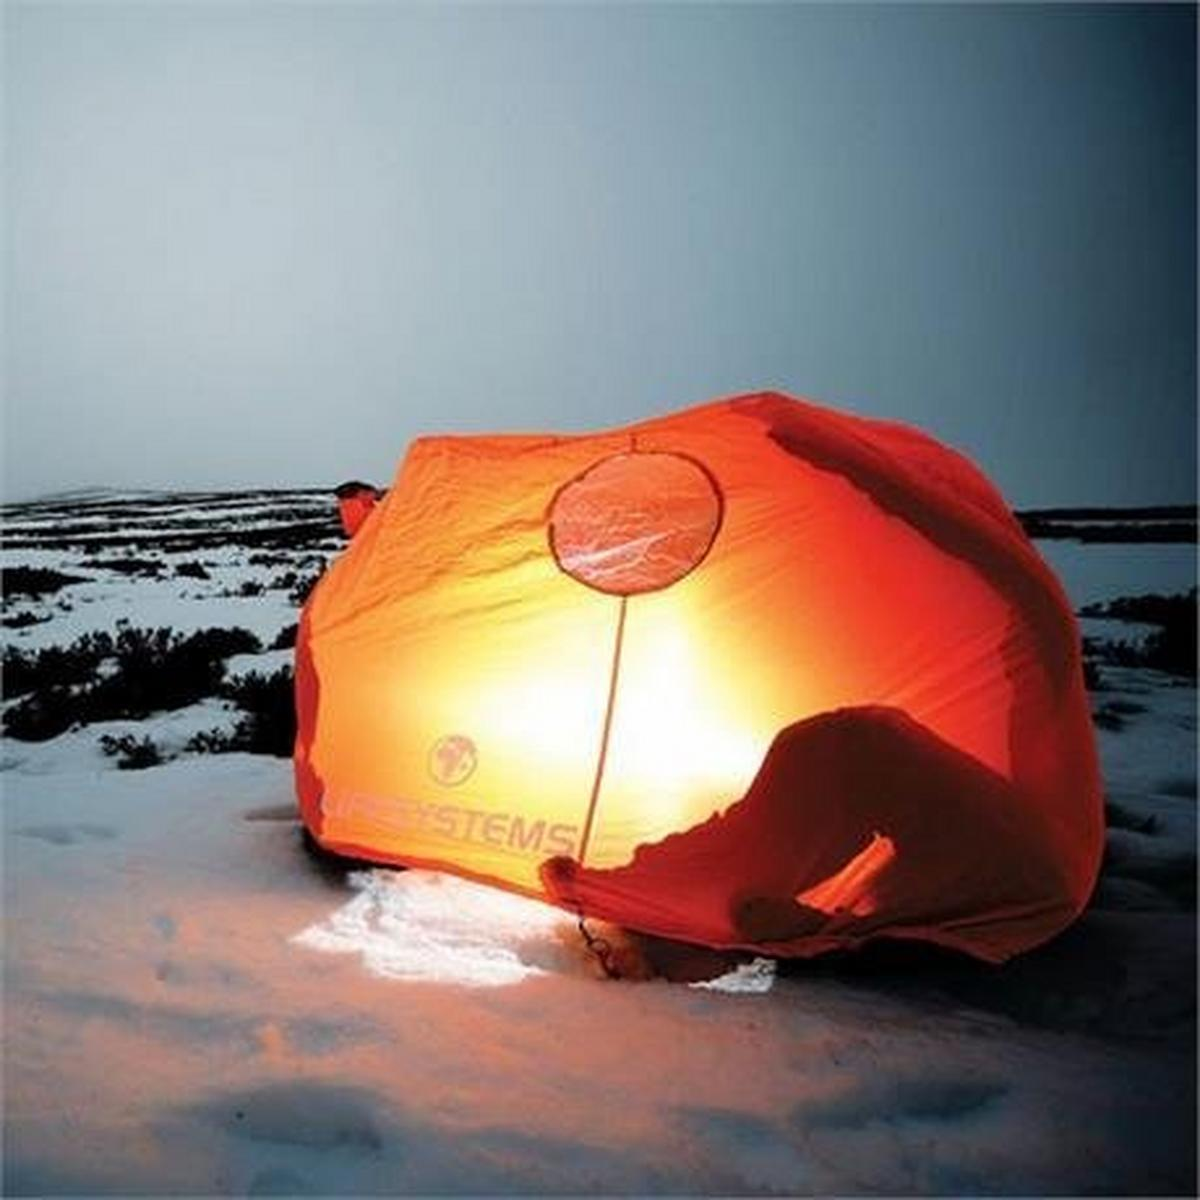 Lifesystems Survival Shelter 4